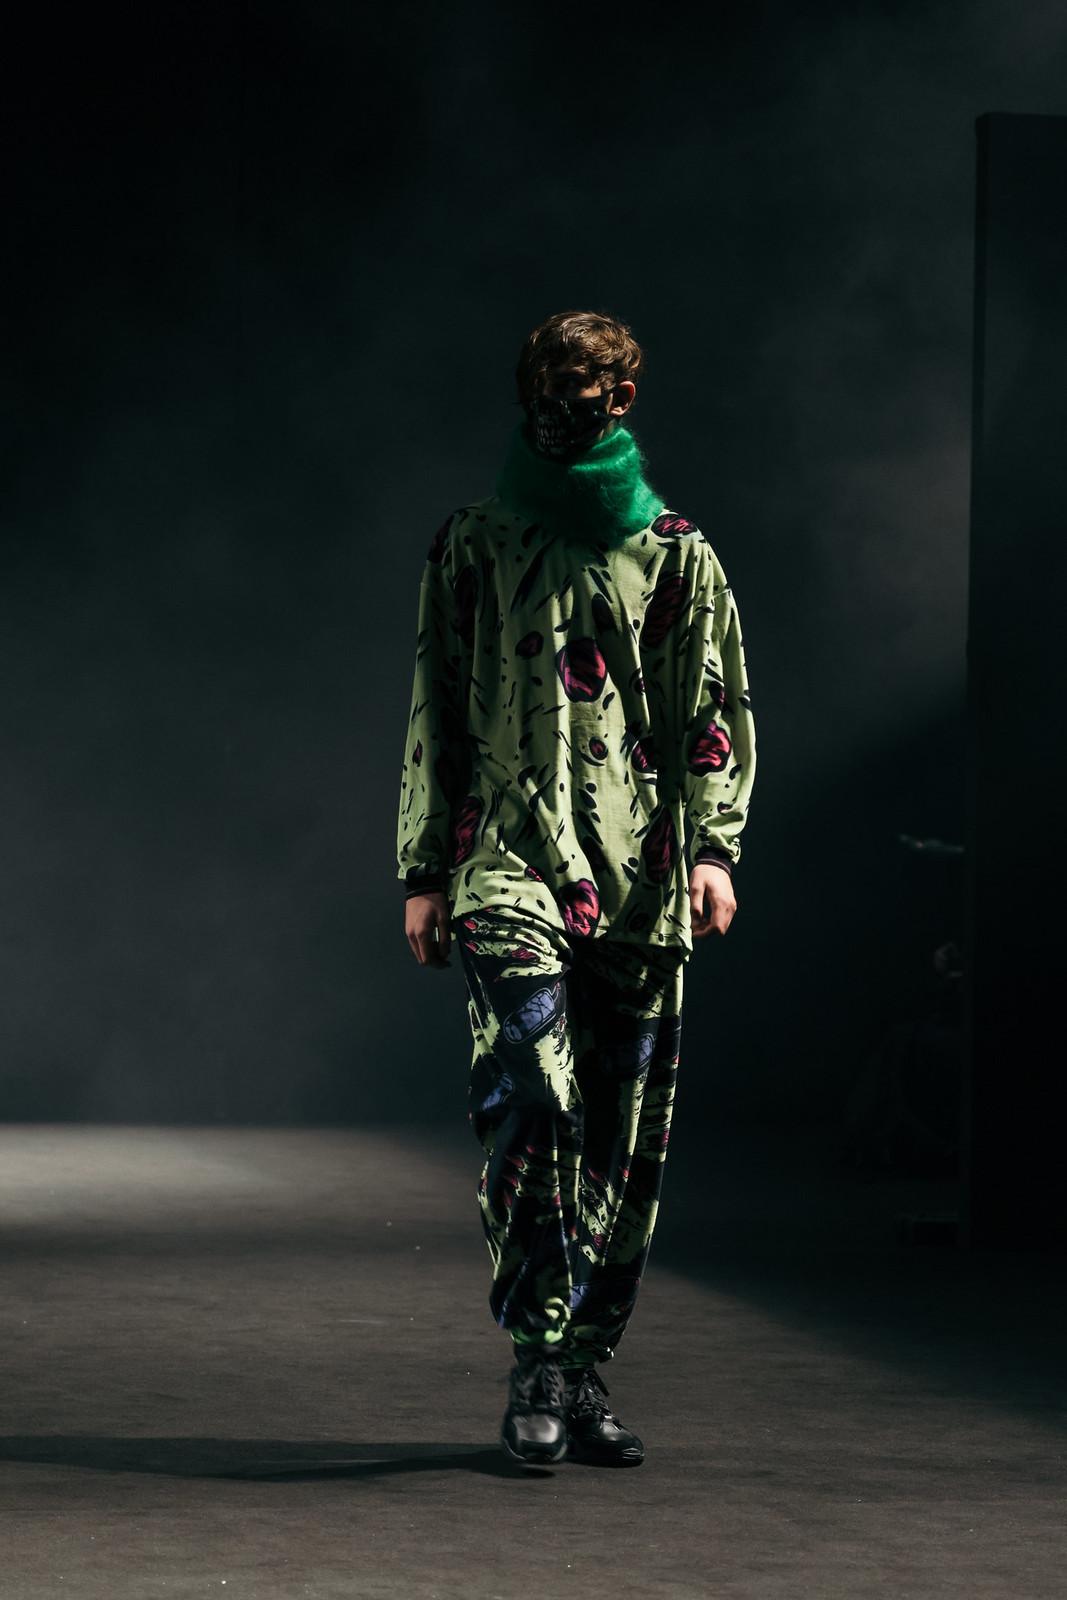 Jessie Chanes - Seams for a desire - 080 Bacelona Fashion #080bcnfasion -50